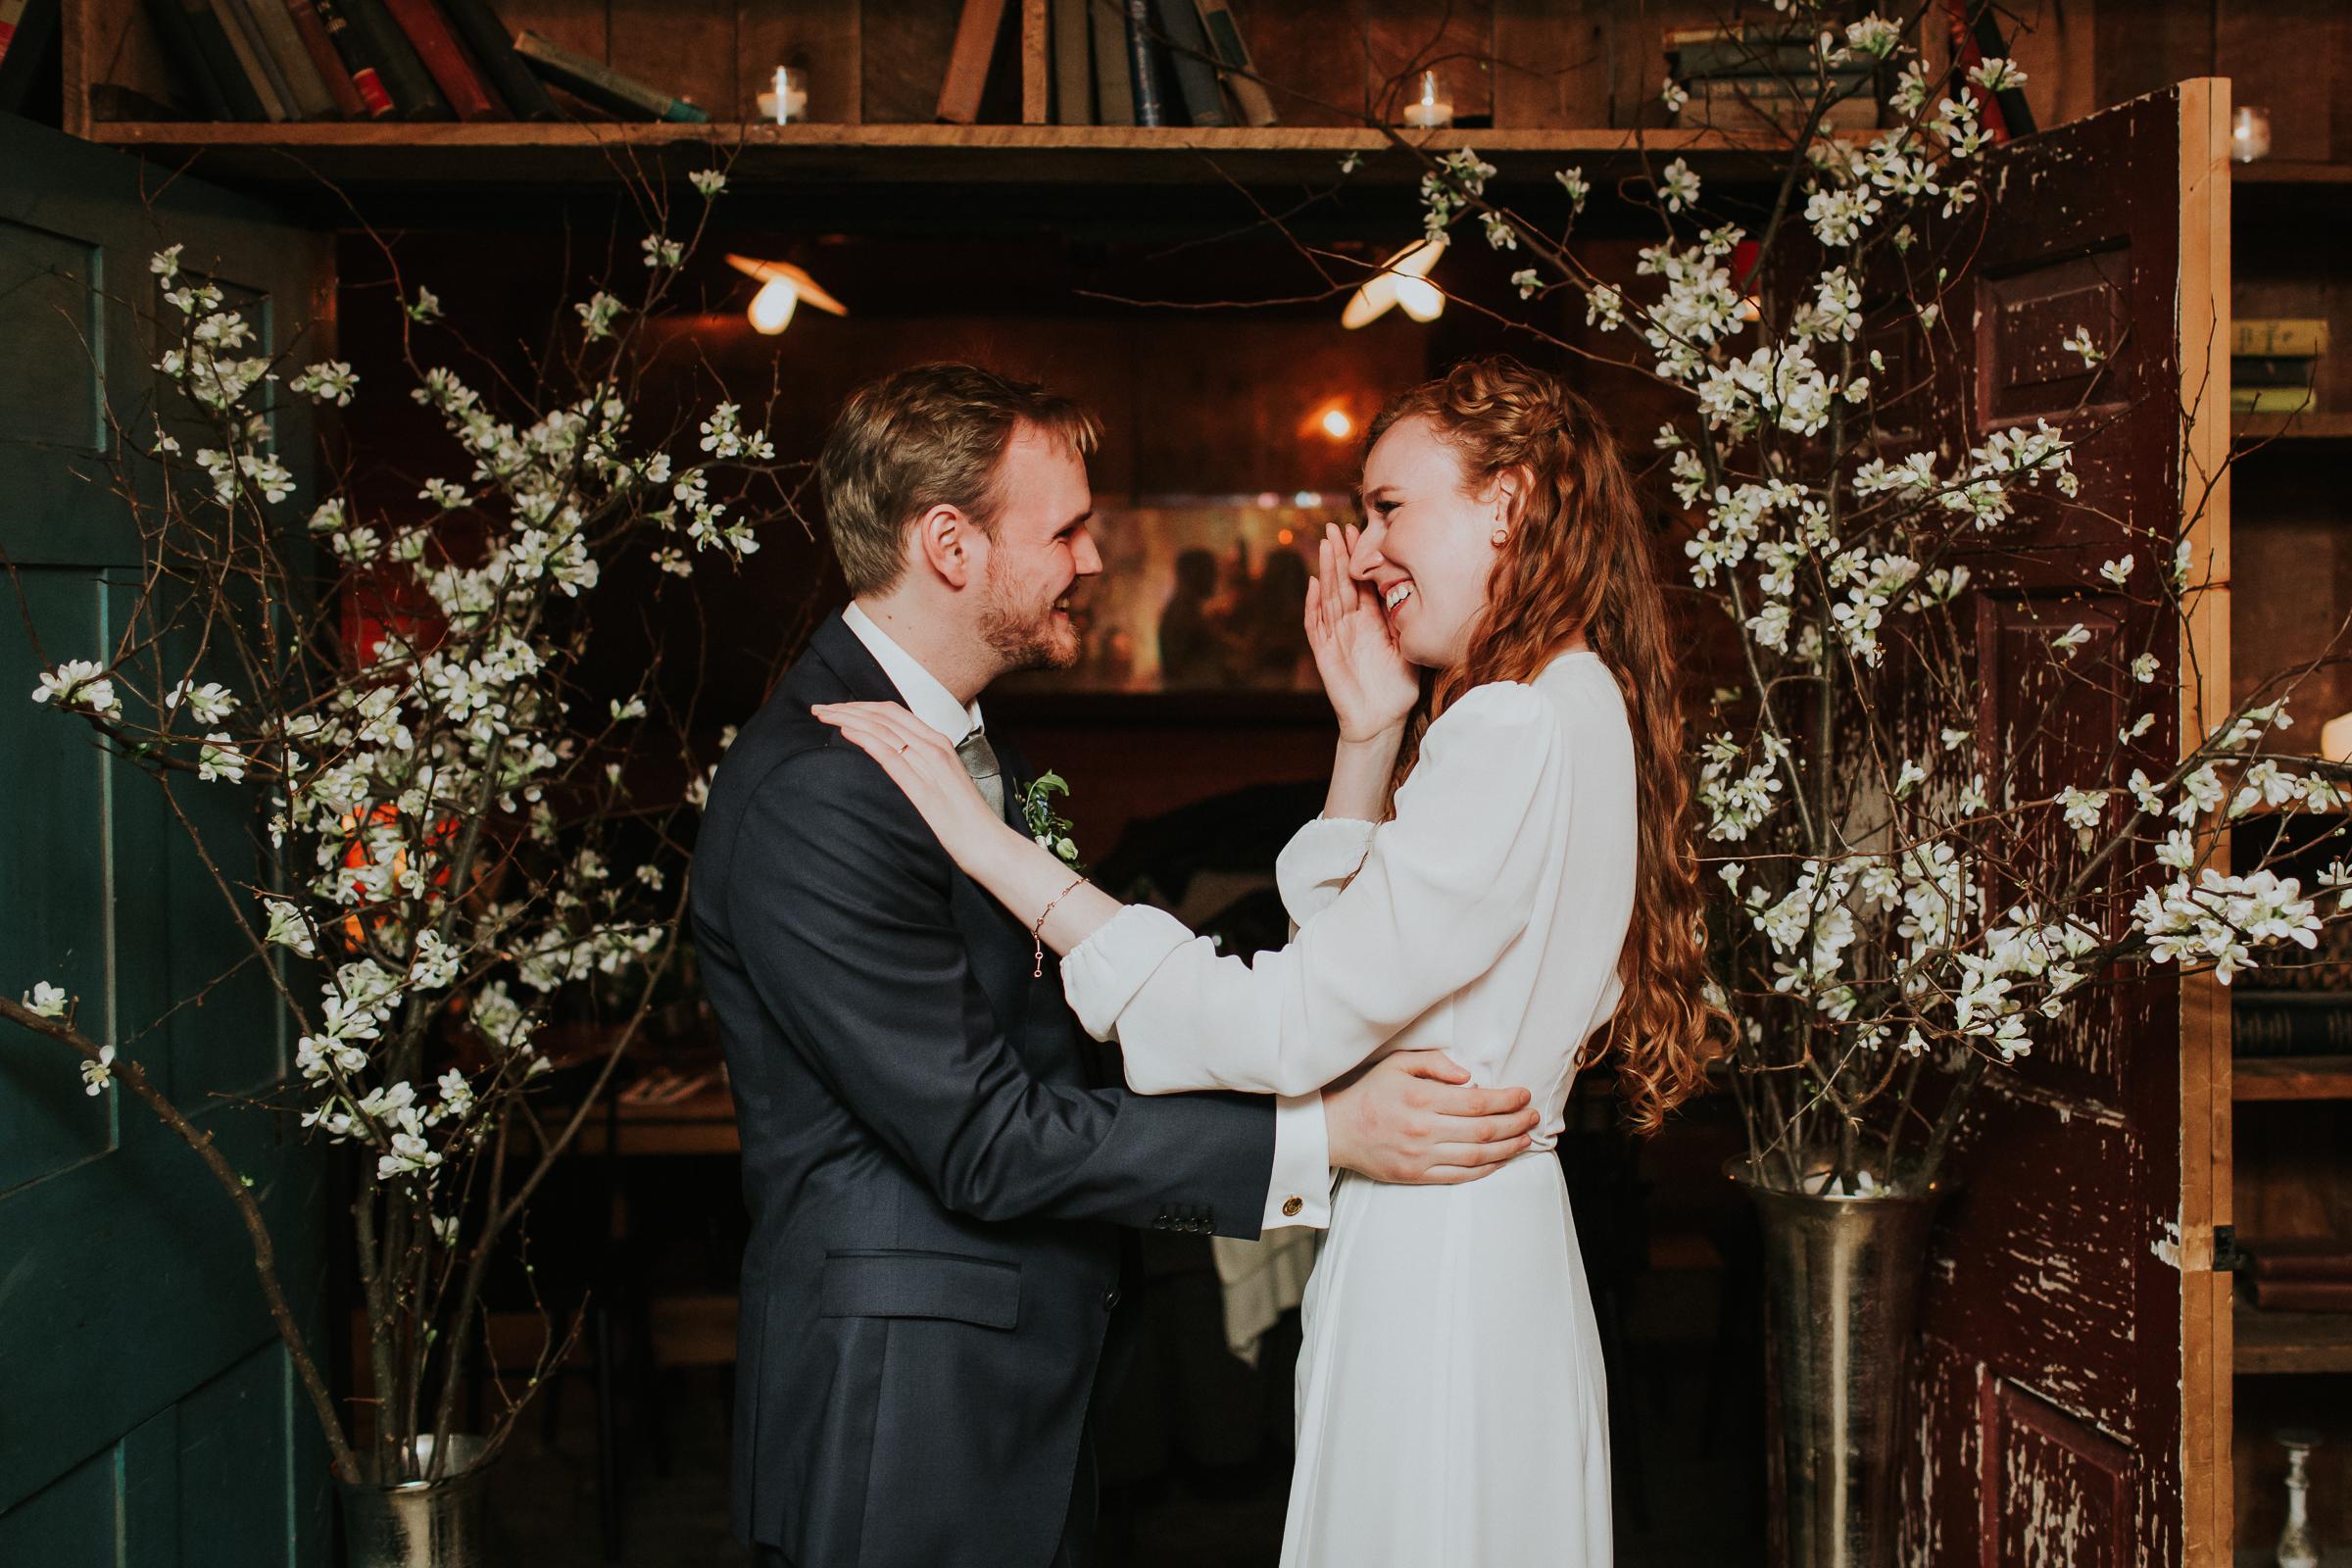 Freemans-Restaurant-Soho-Brooklyn-Bridge-Park-Dumbo-Documentary-Wedding-Photographer-50.jpg